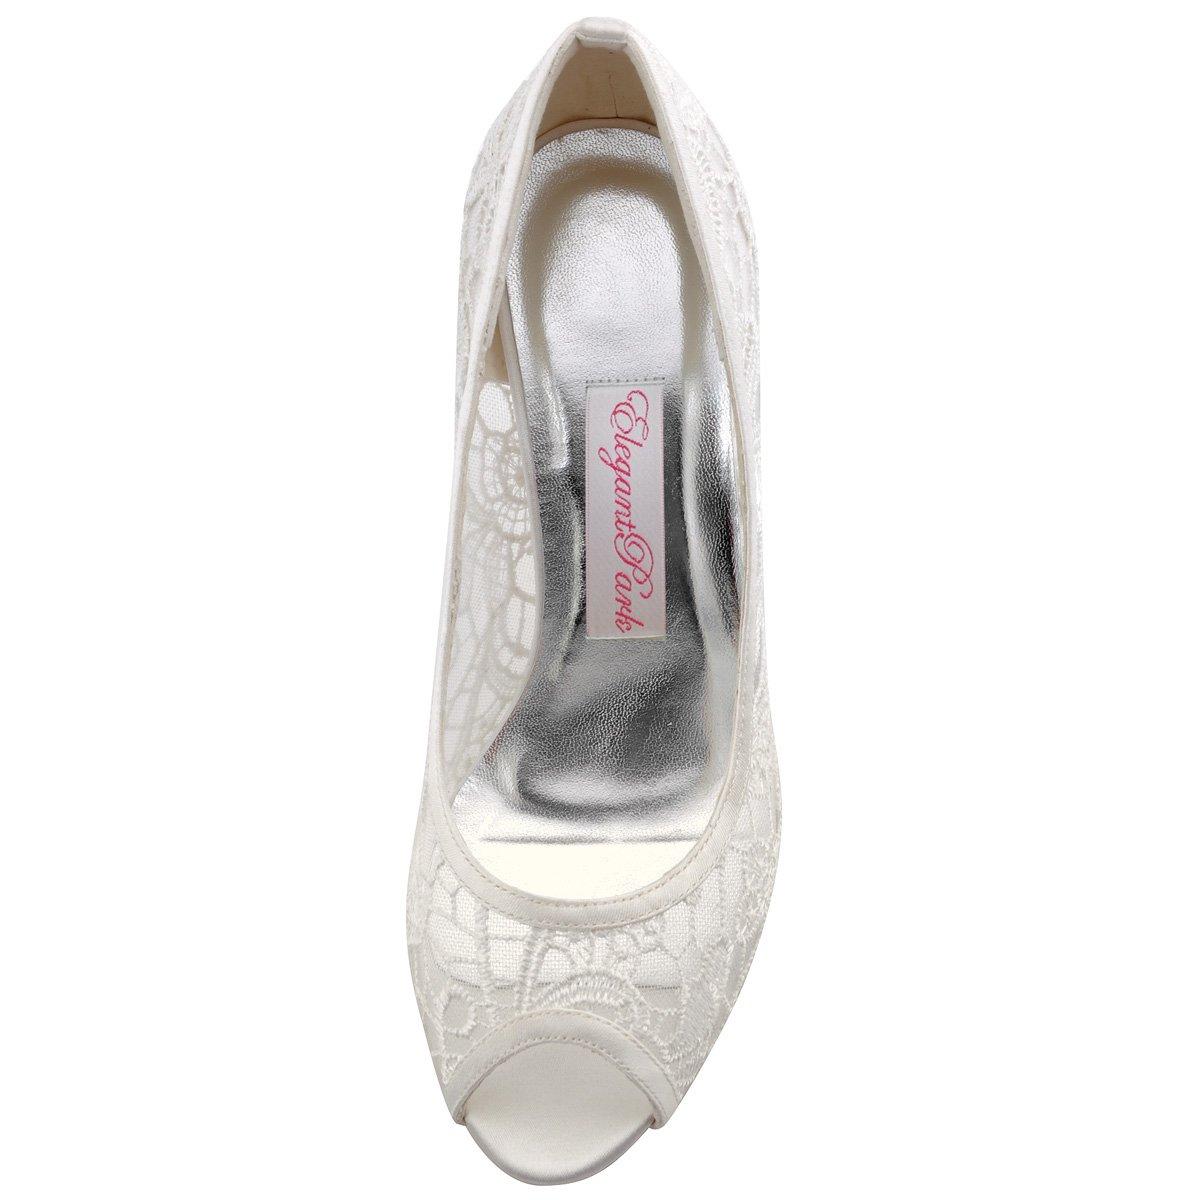 ElegantPark Ivory Women Peep Toe High Heel Pumps Vintage Lace Wedding Dress Shoes 2